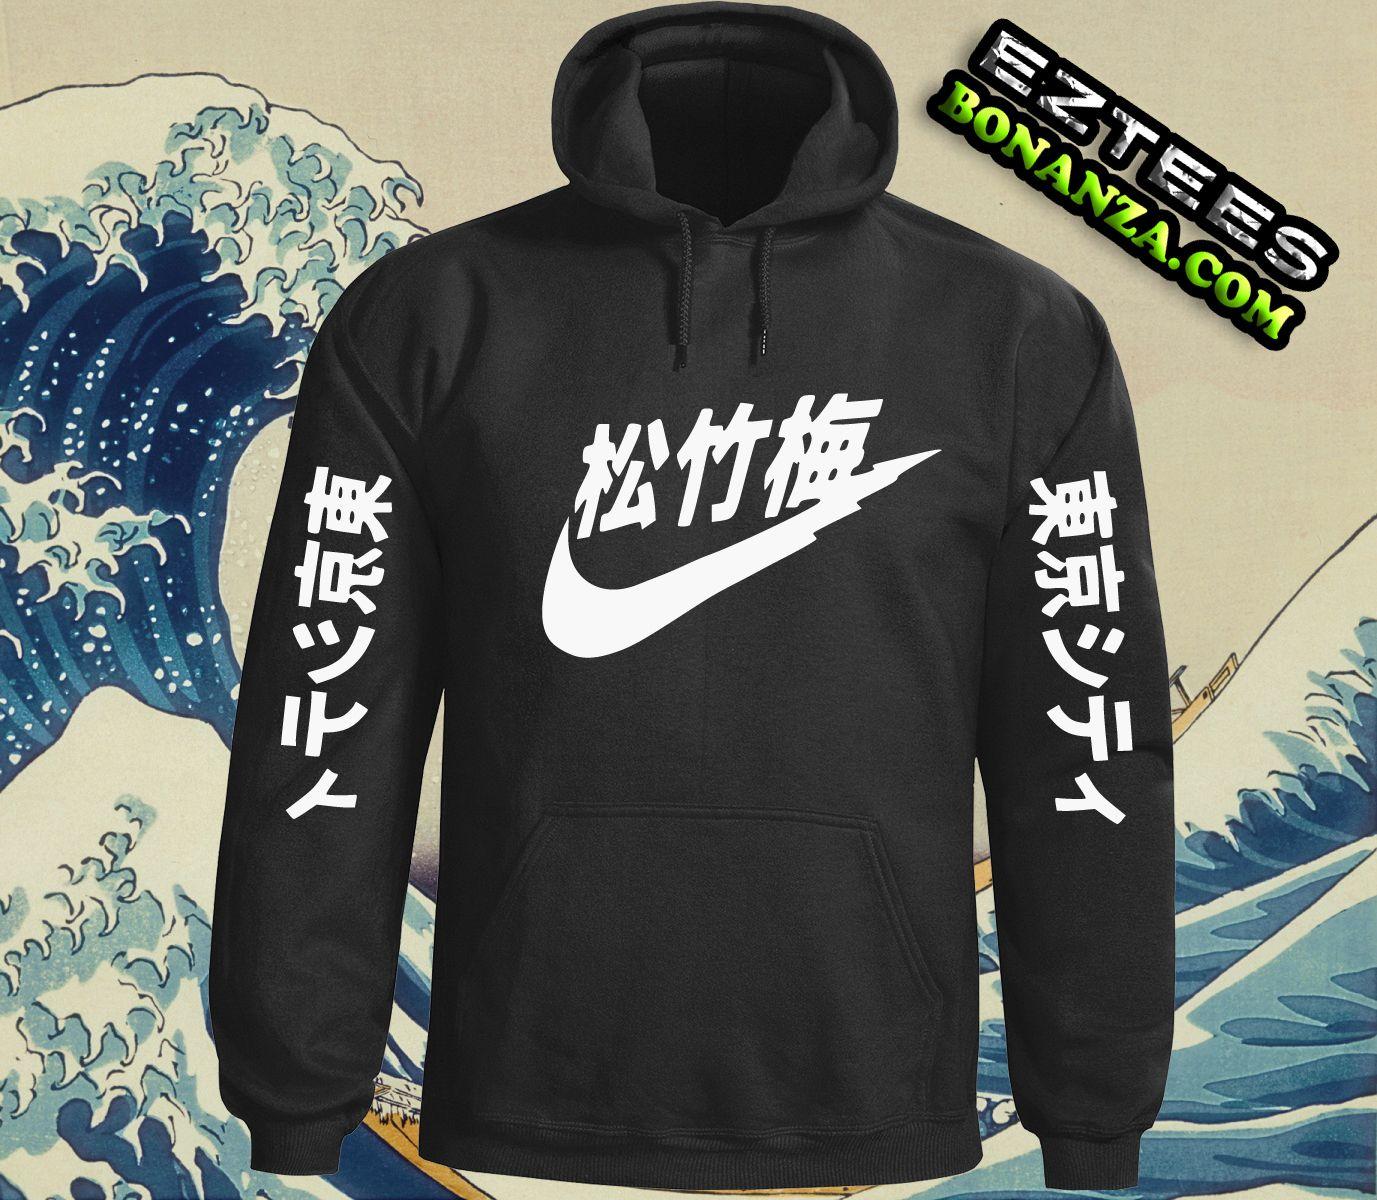 Vintage Very Rare KYC Hoodie Air Nike Japan VTG,HBA Been Trill Supreme #1